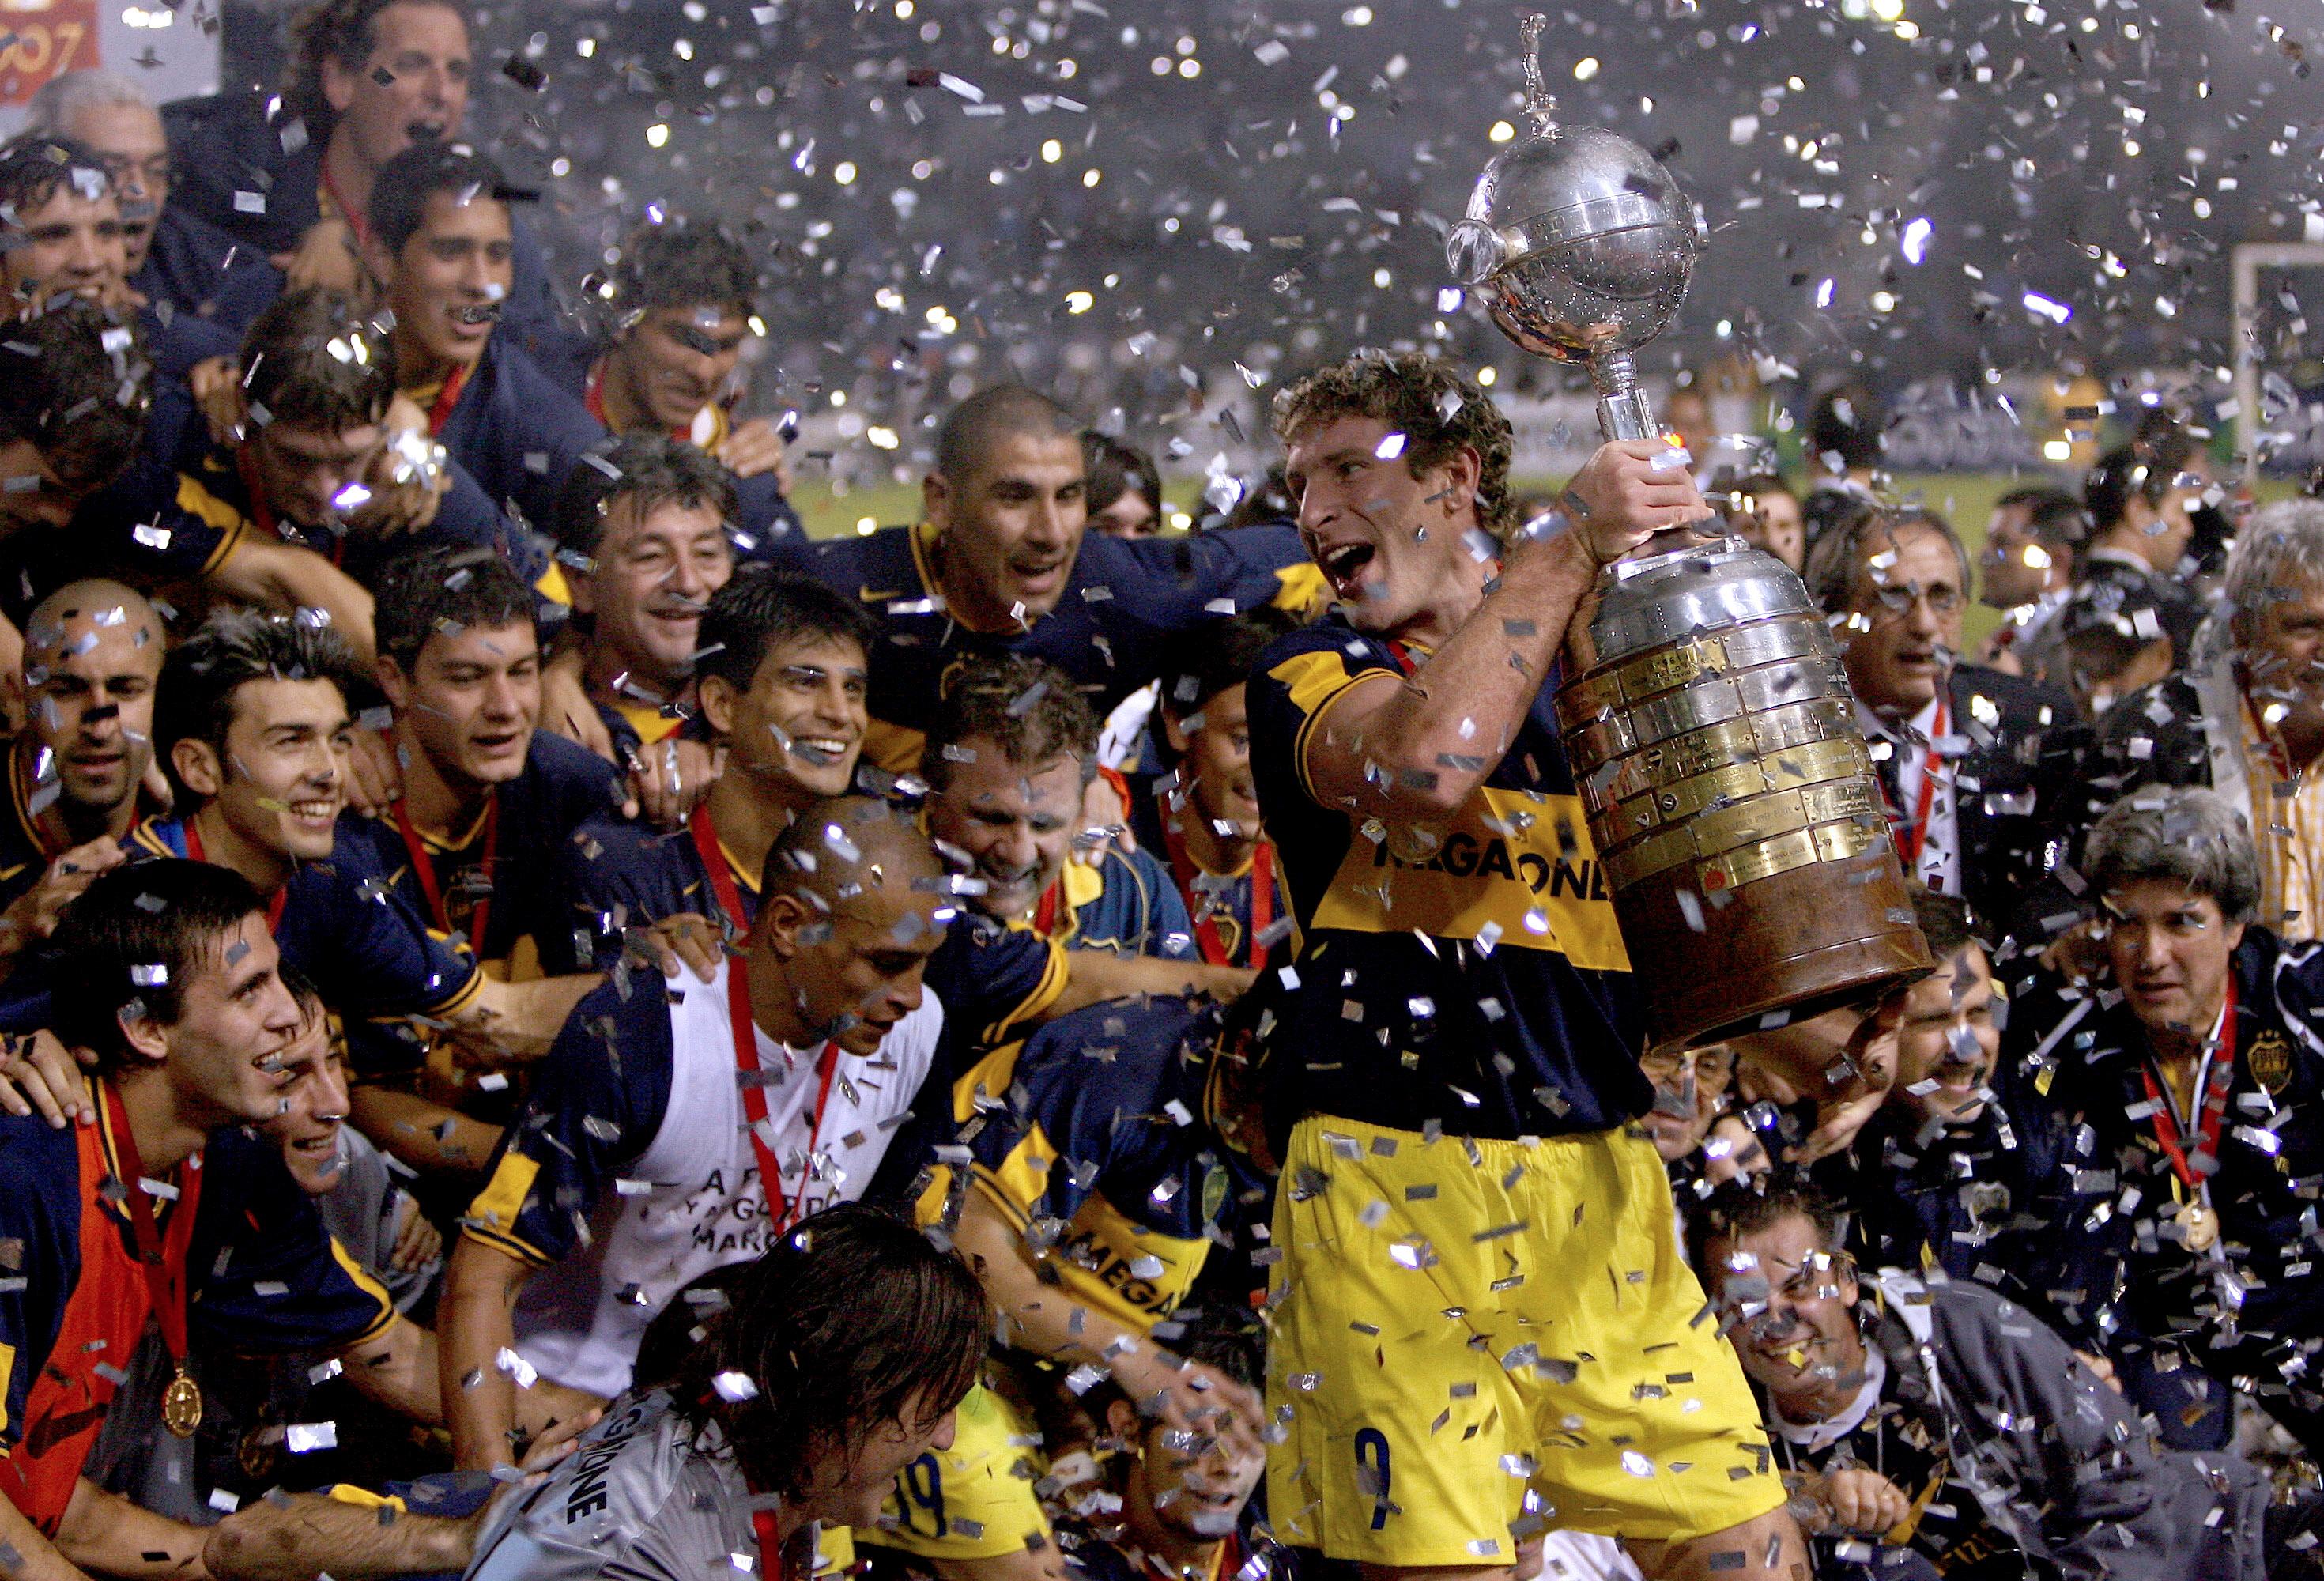 boca-campeon-libertadores-2007-palermo-copa-arc